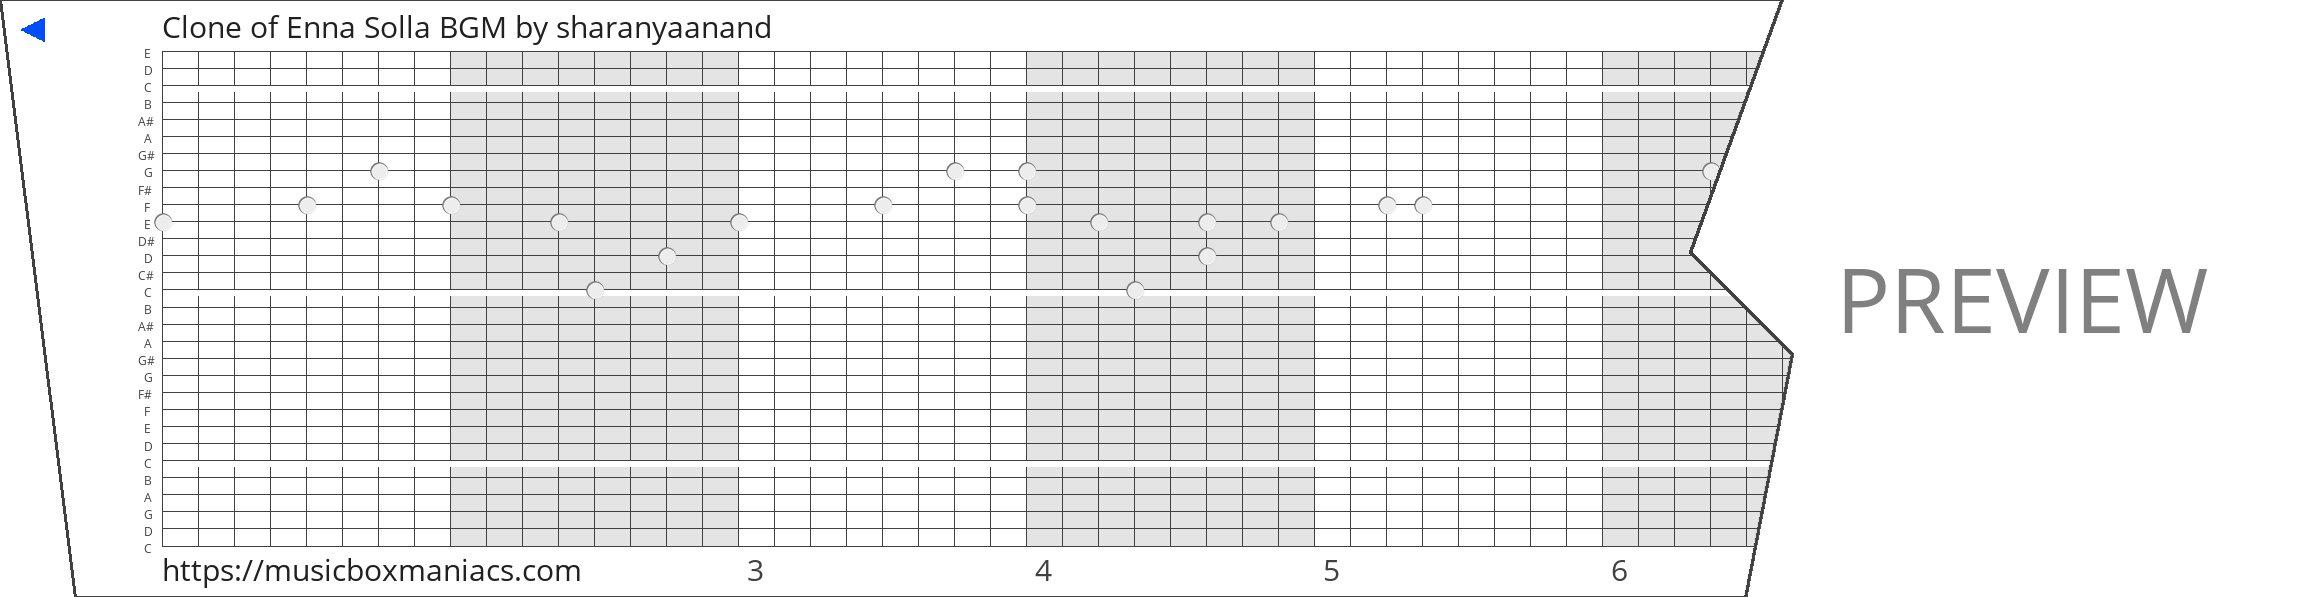 Clone of Enna Solla BGM 30 note music box paper strip